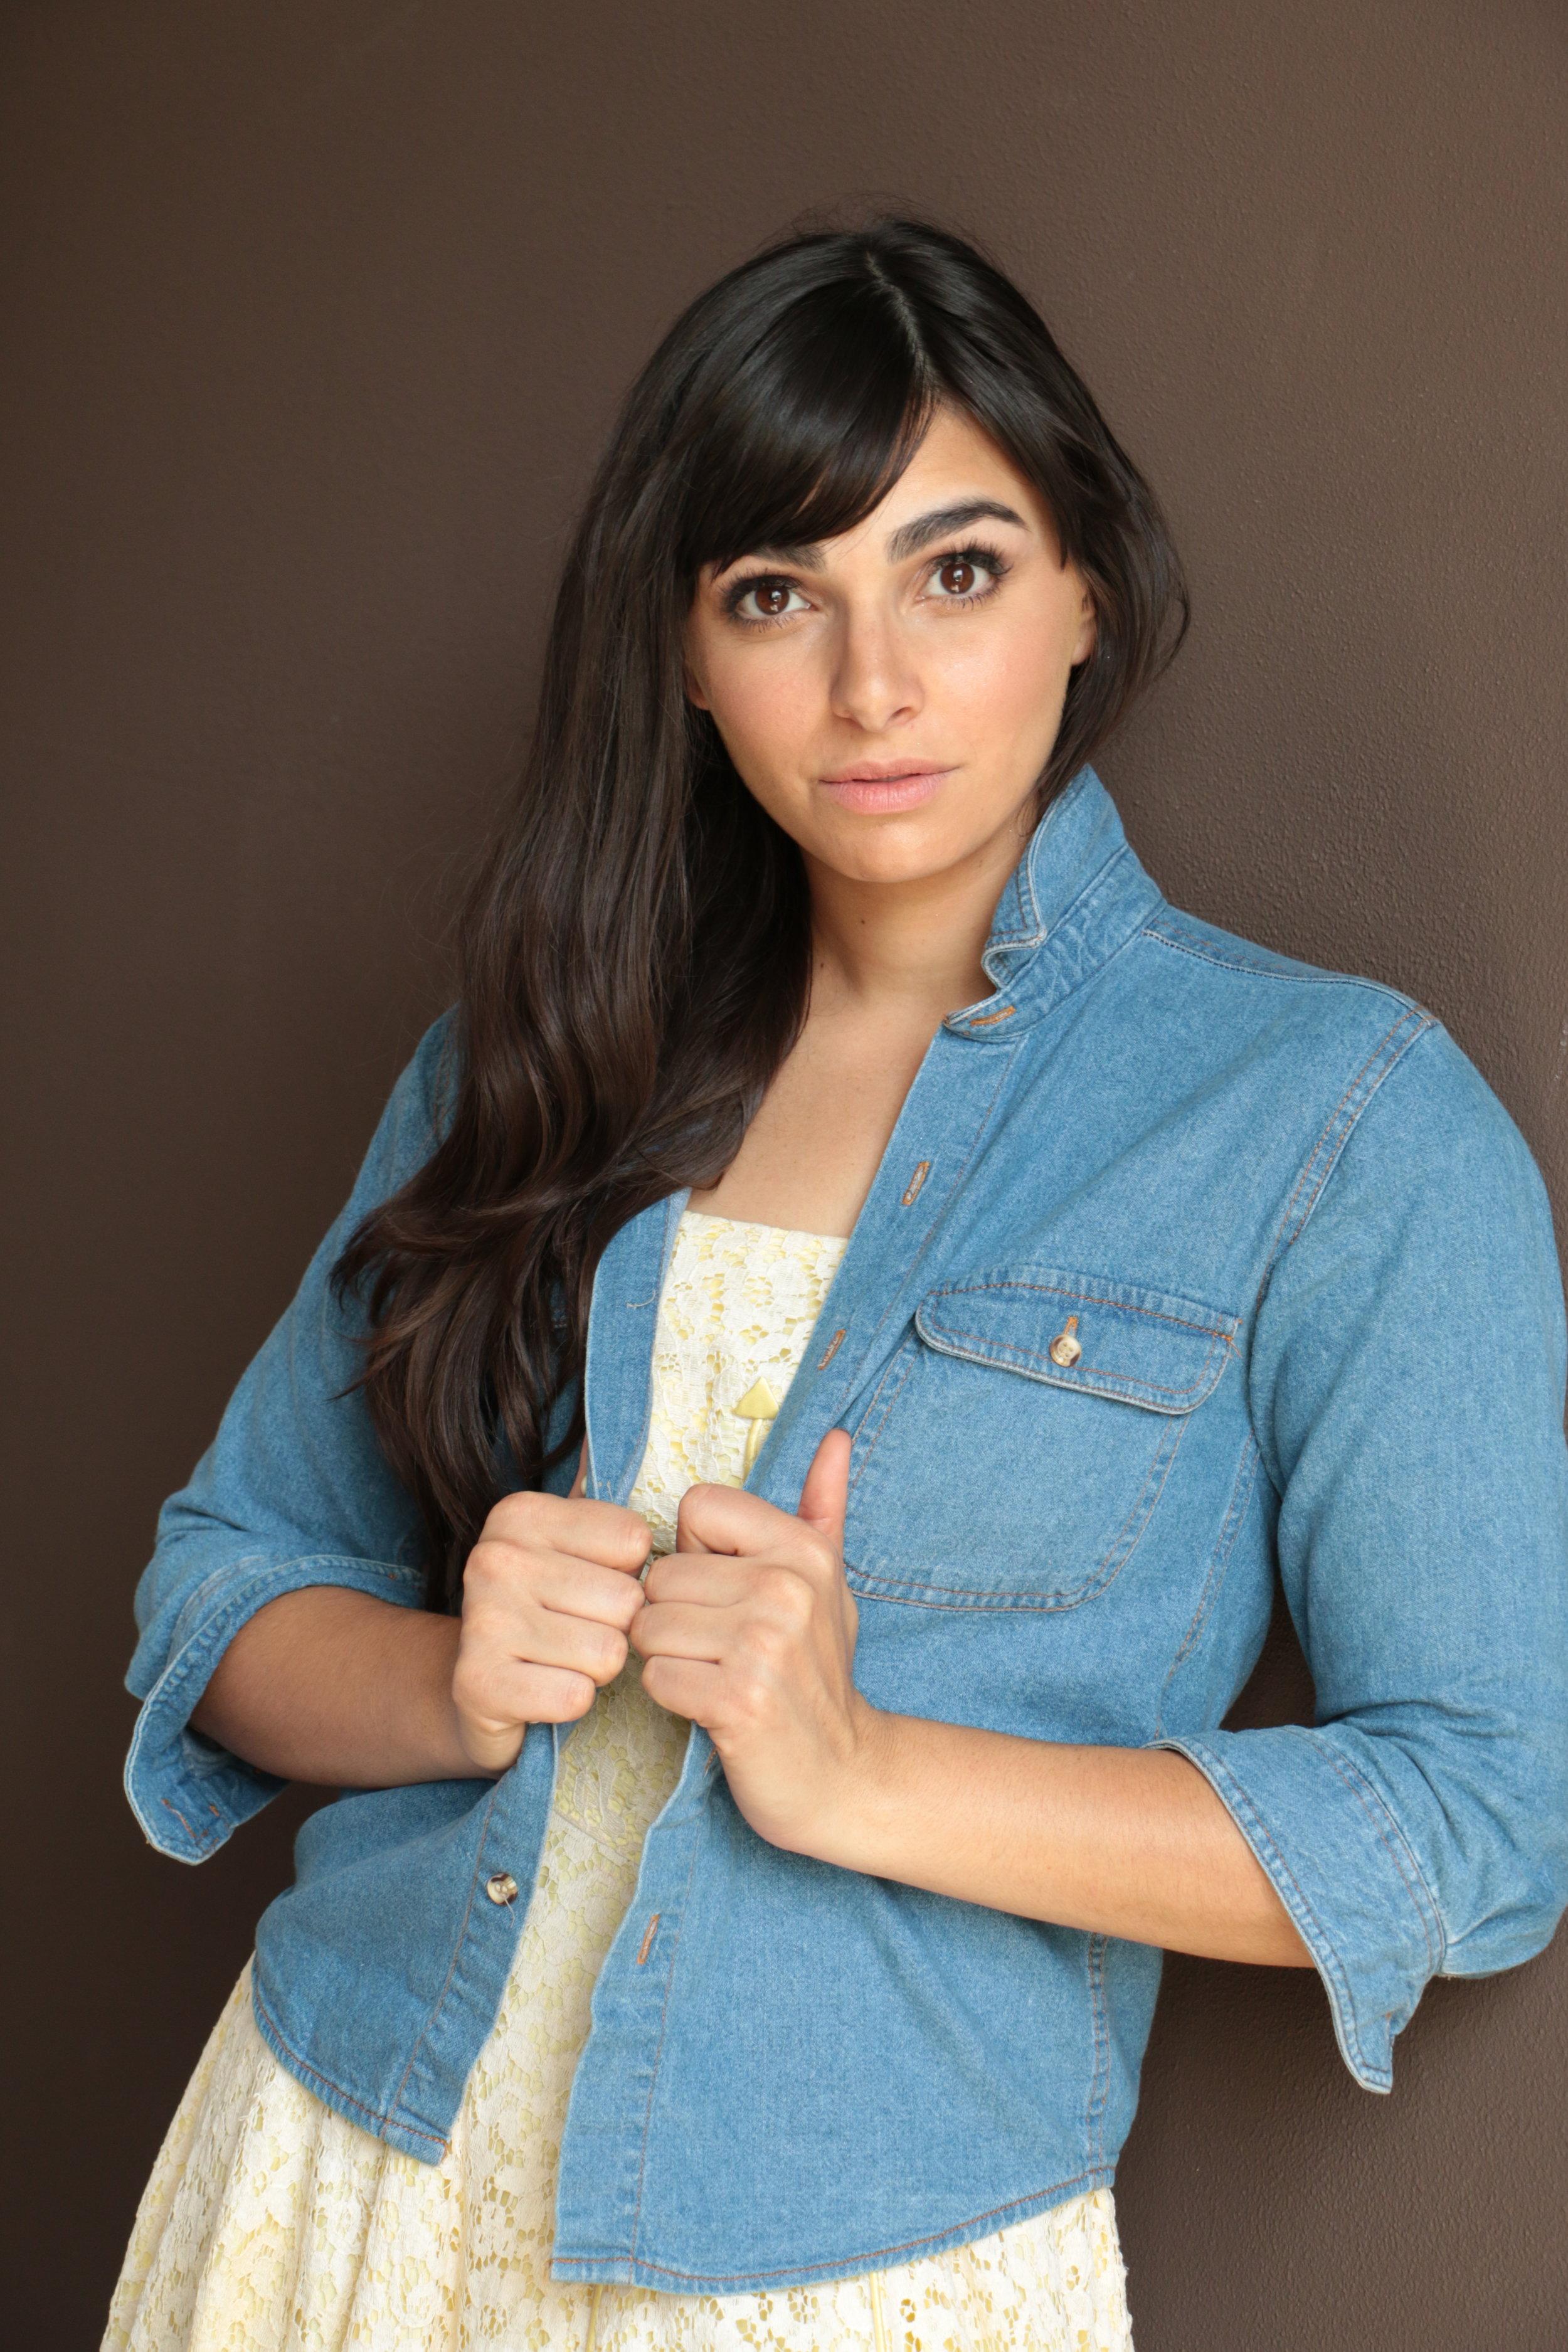 Female model Headshot in denim shirt